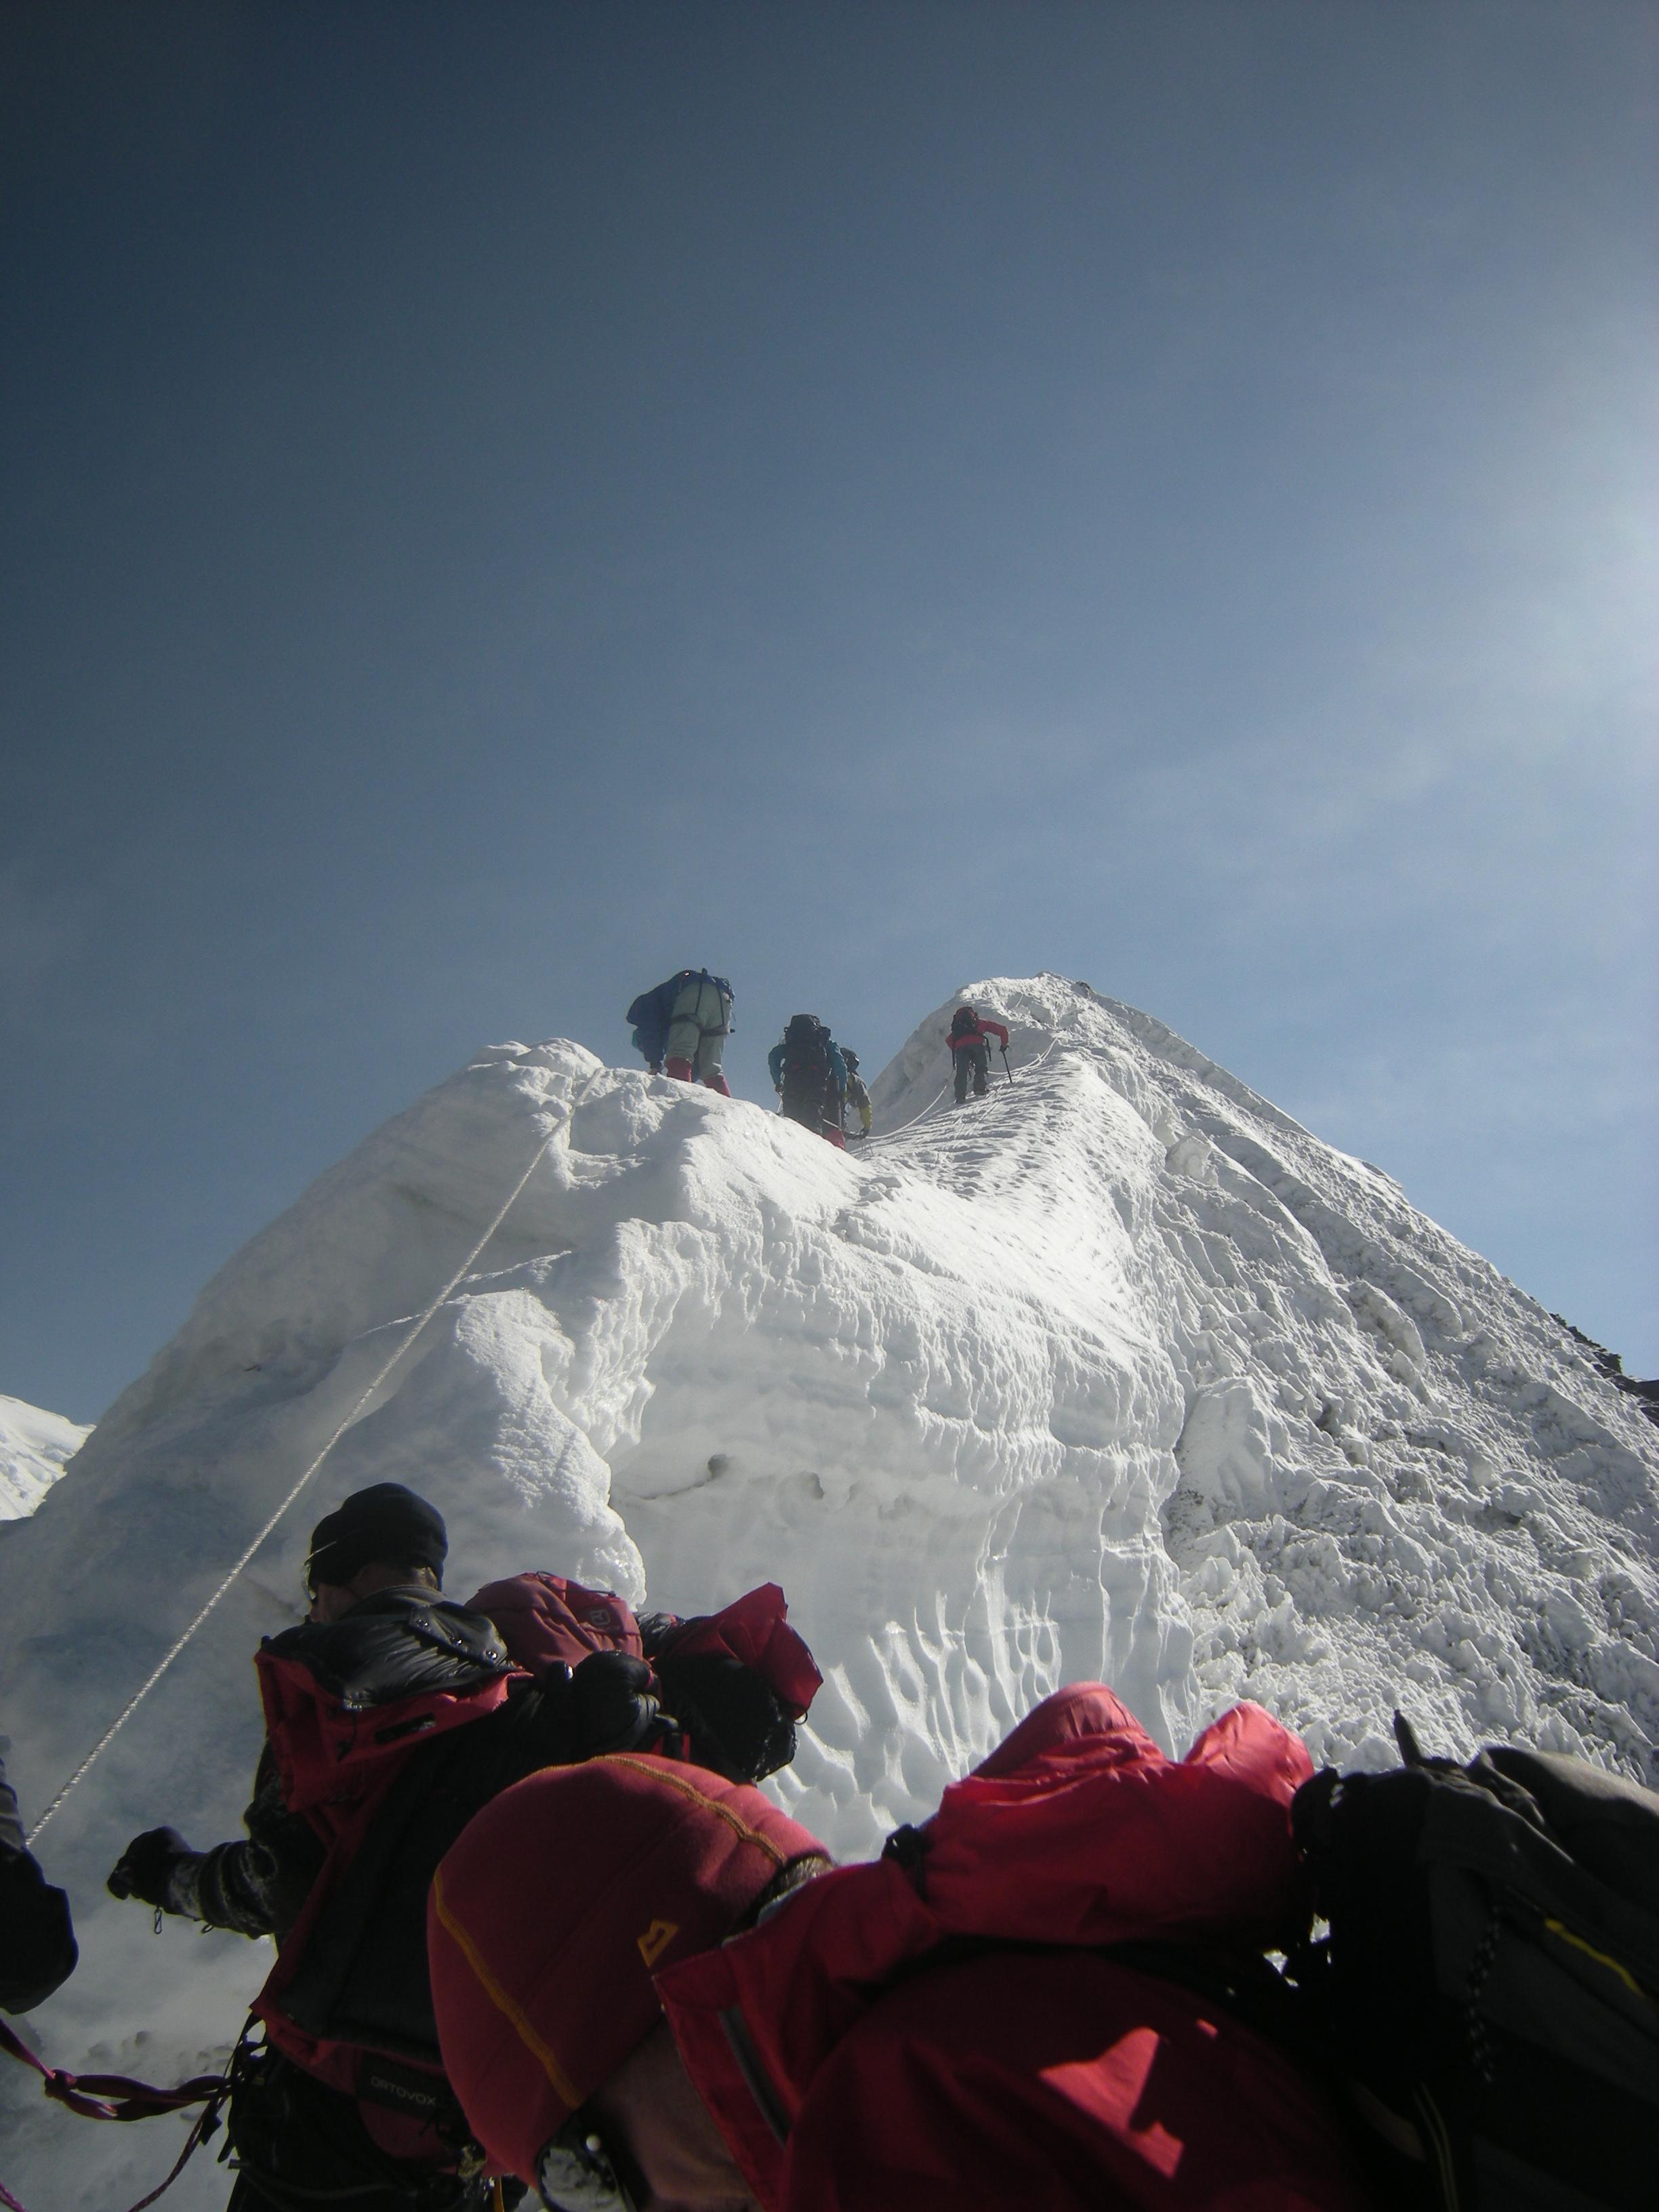 island peak climing.JPG